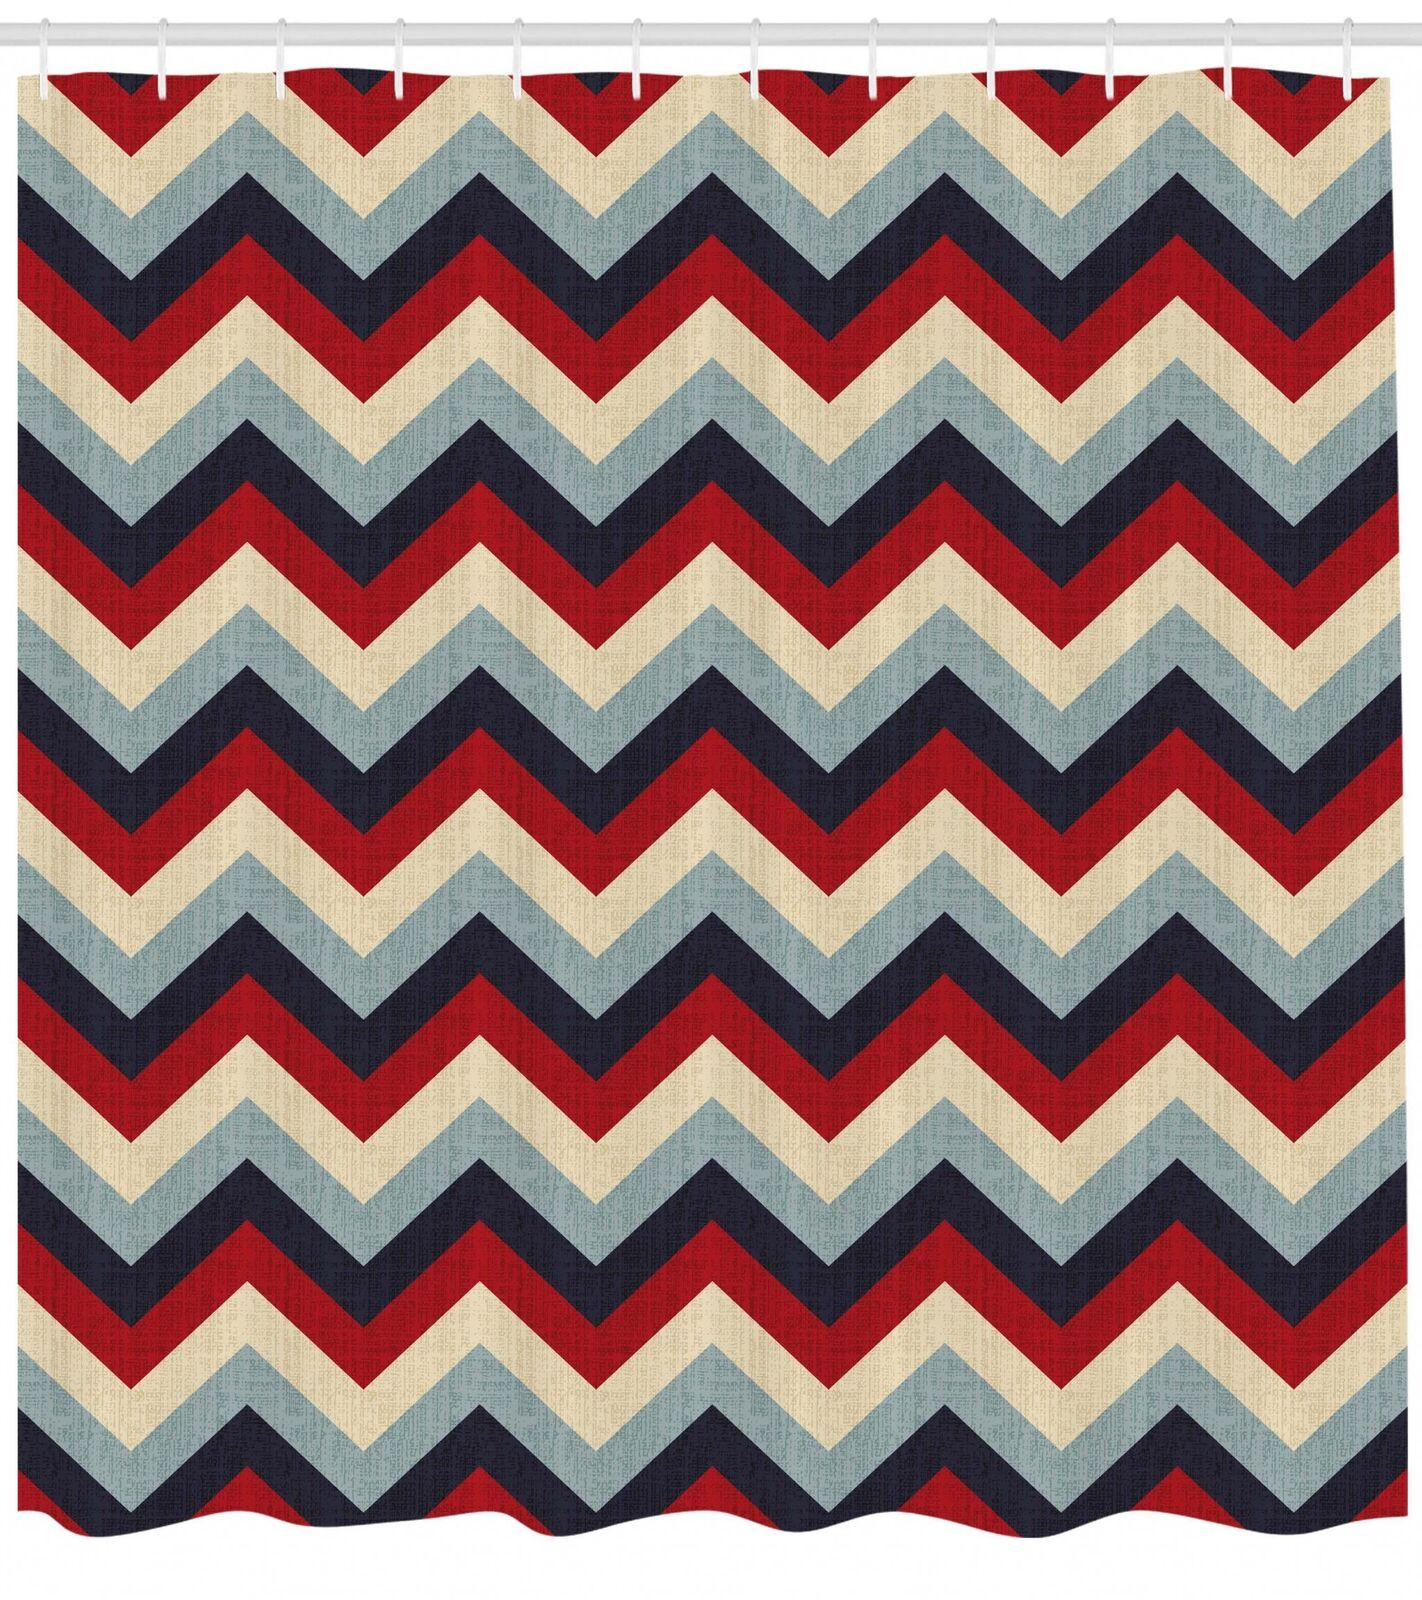 Retro Girls Pattern Shower Curtain Fabric Decor Set with Hooks 4 Größes